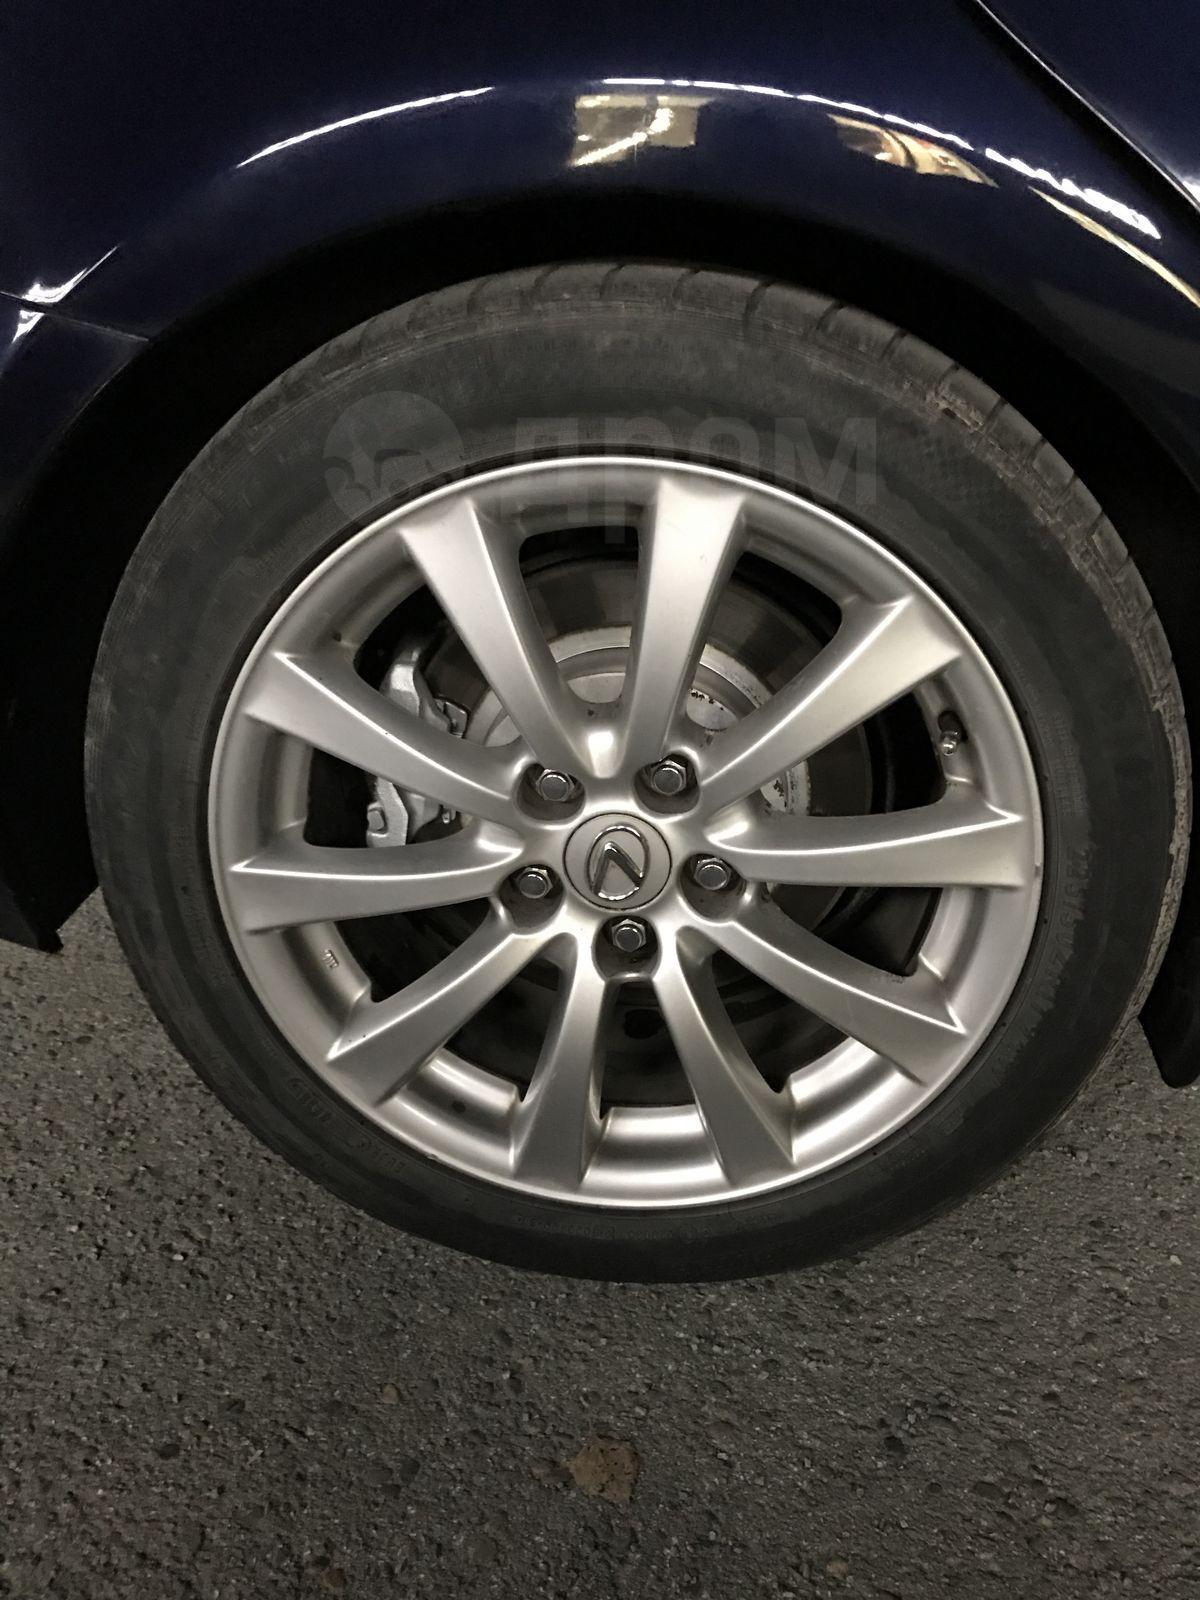 Toyota crown купить запчасти